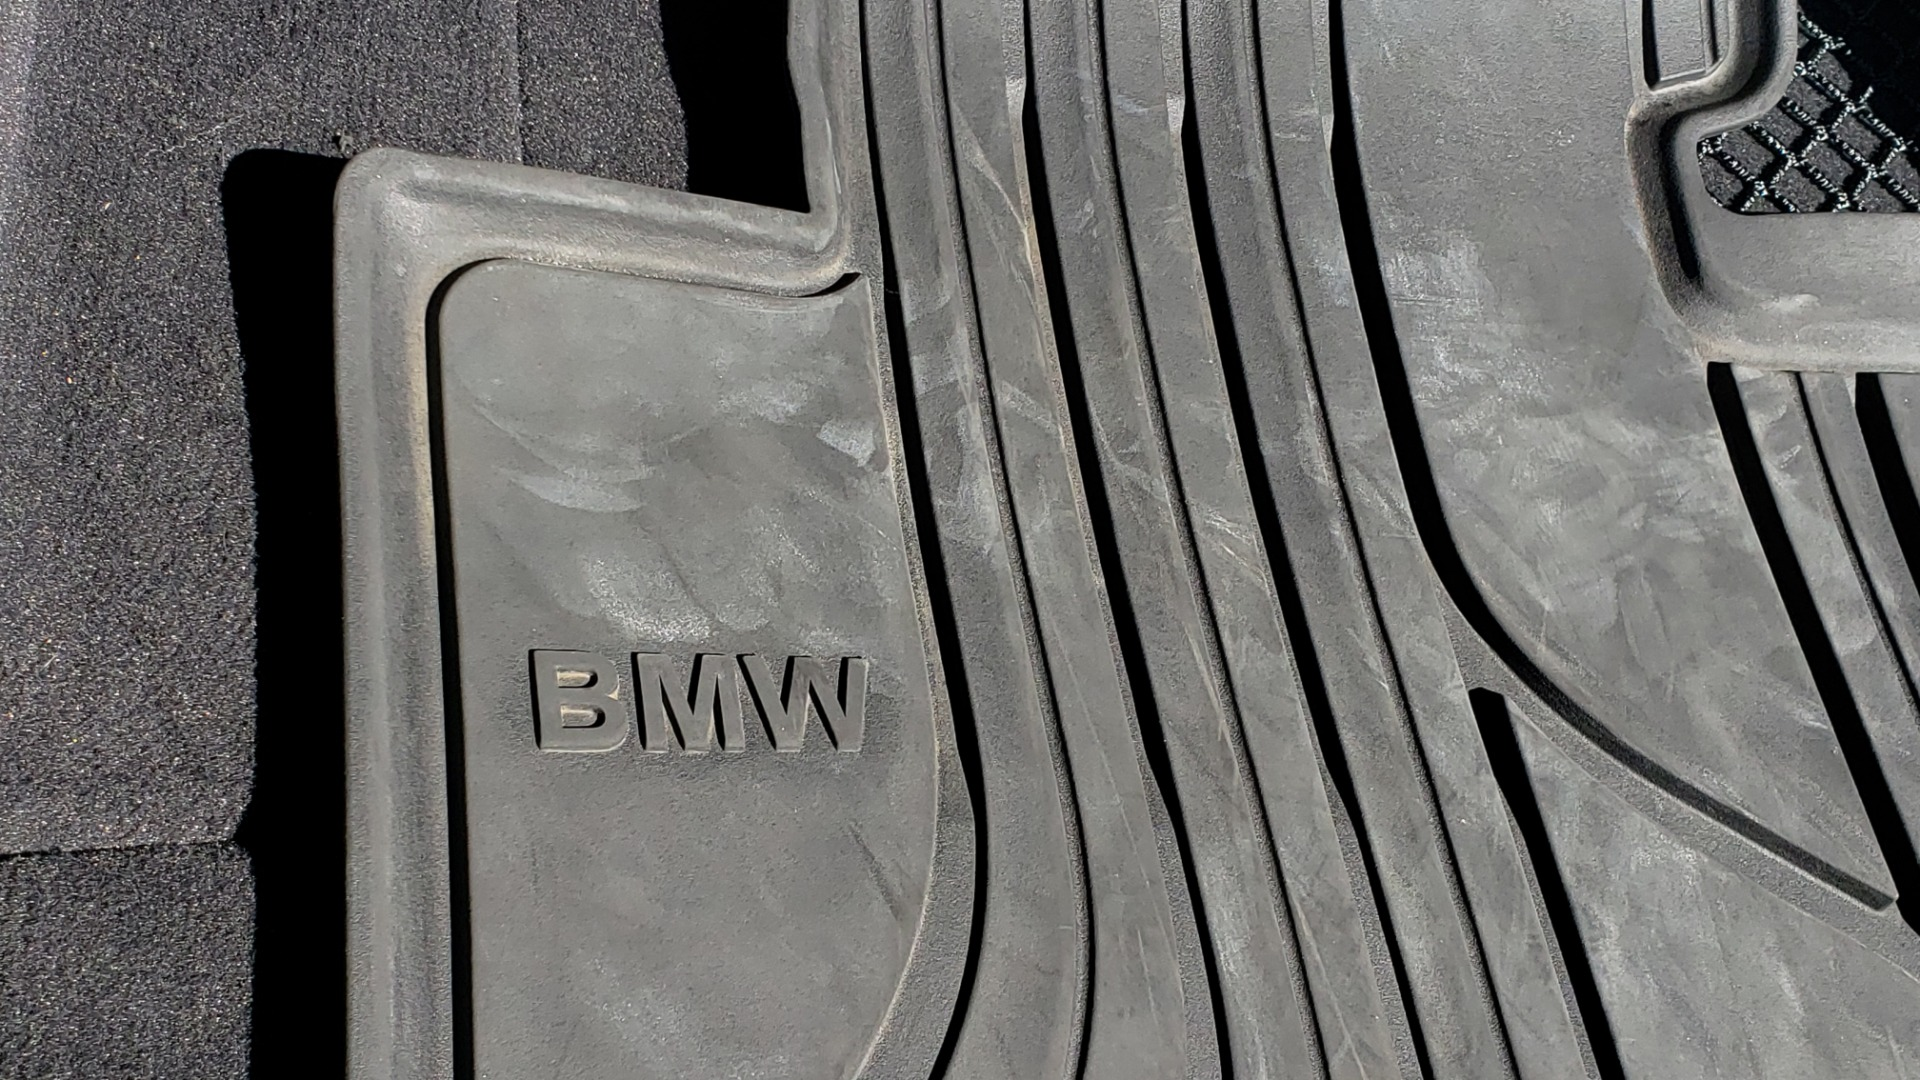 Used 2018 BMW 4 SERIES 430IXDRIVE / PREMIUM / NAV / SUNROOF / ESSENTIALS PKG for sale $29,495 at Formula Imports in Charlotte NC 28227 18